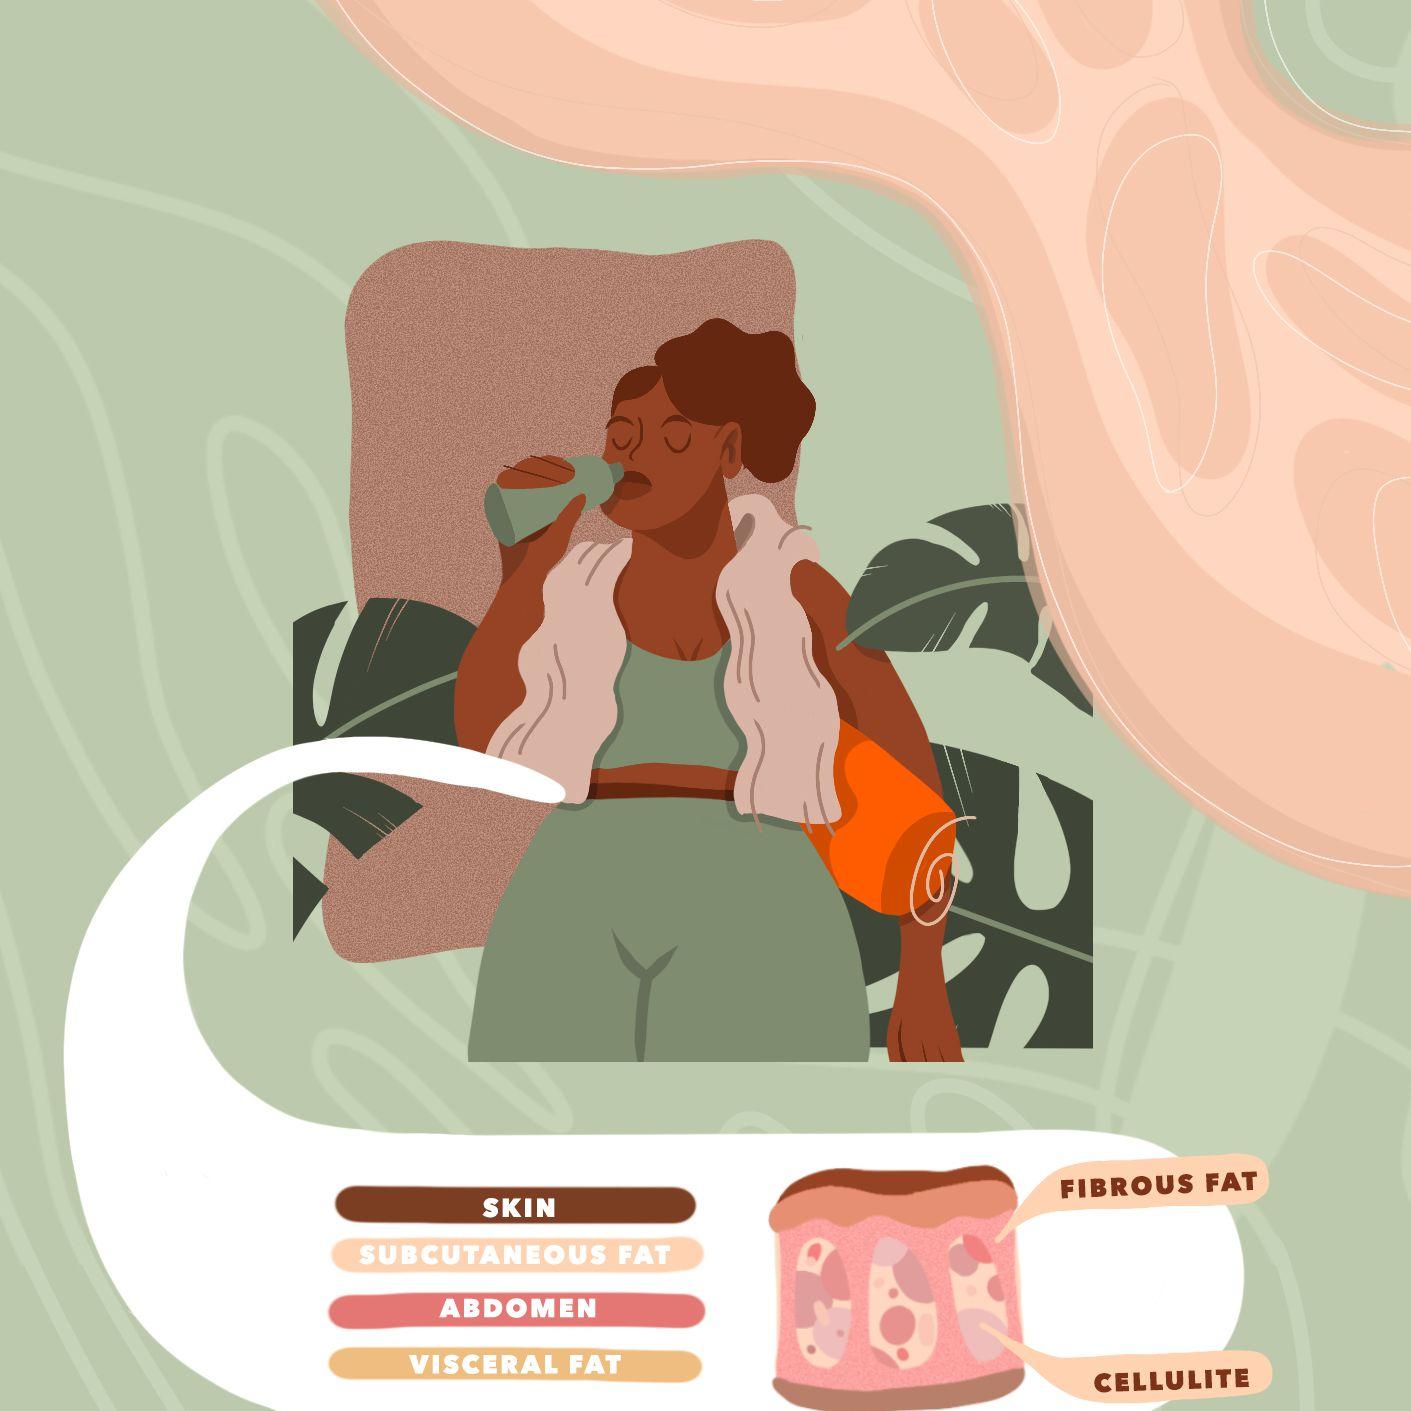 types of body fat illustration